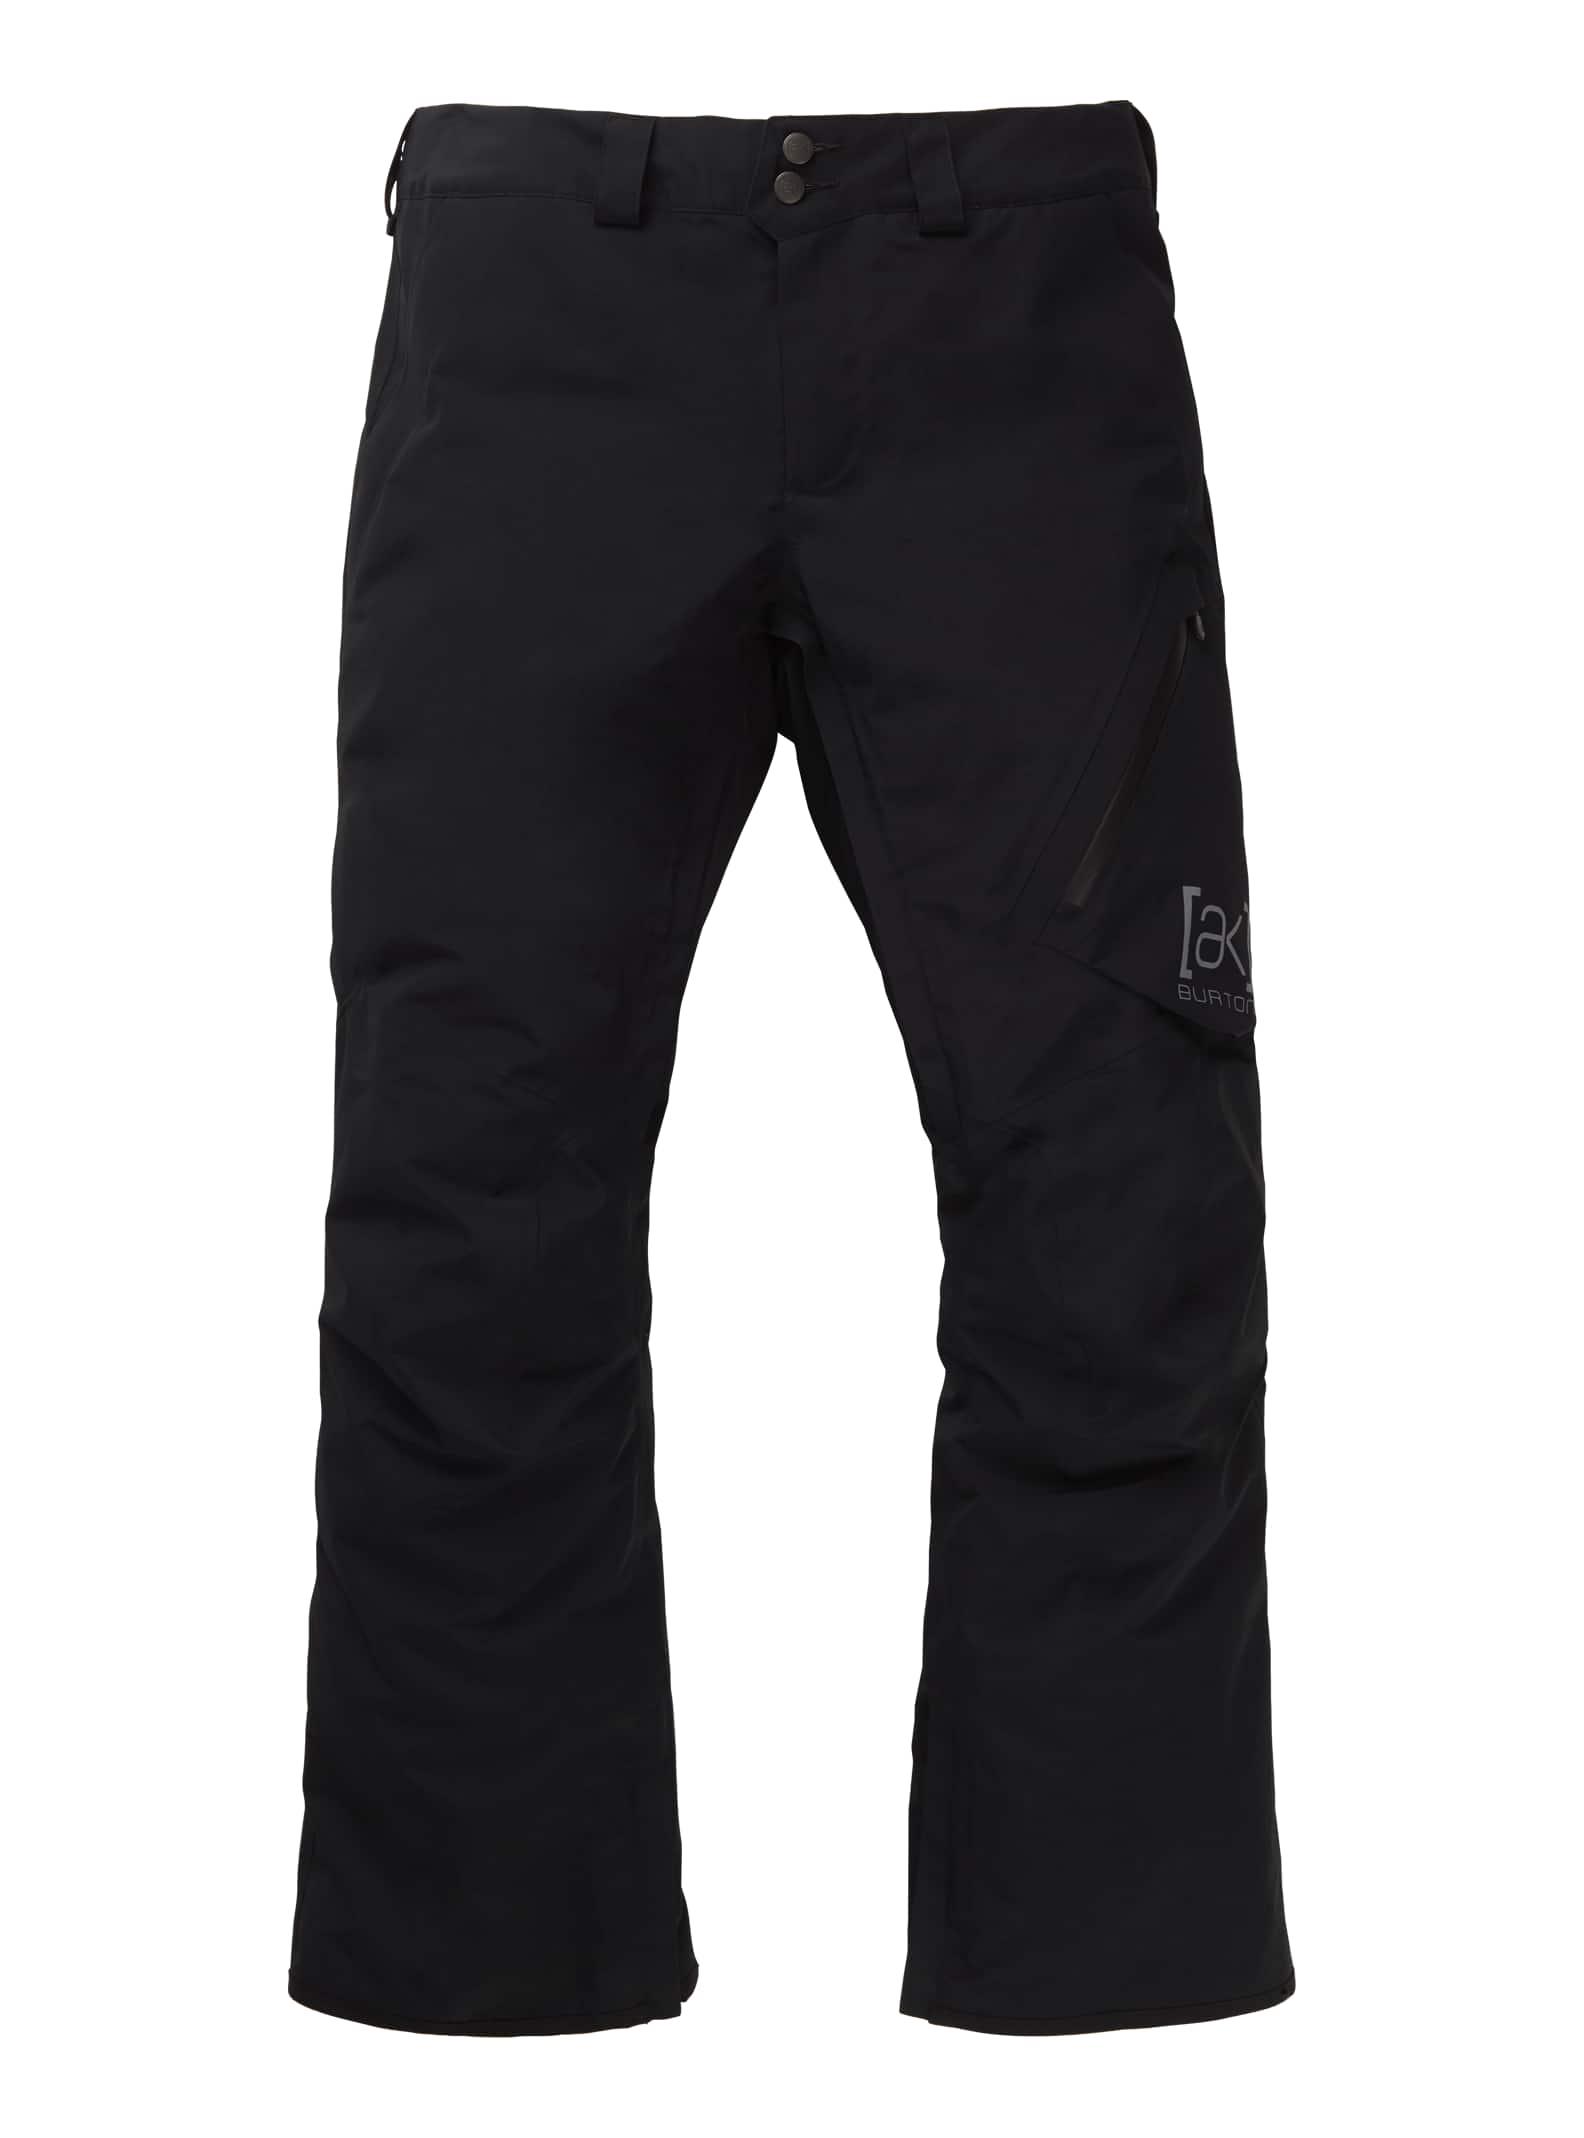 Burton [ak] GORE‑TEX Cyclicbyxa för herrar, True Black, L